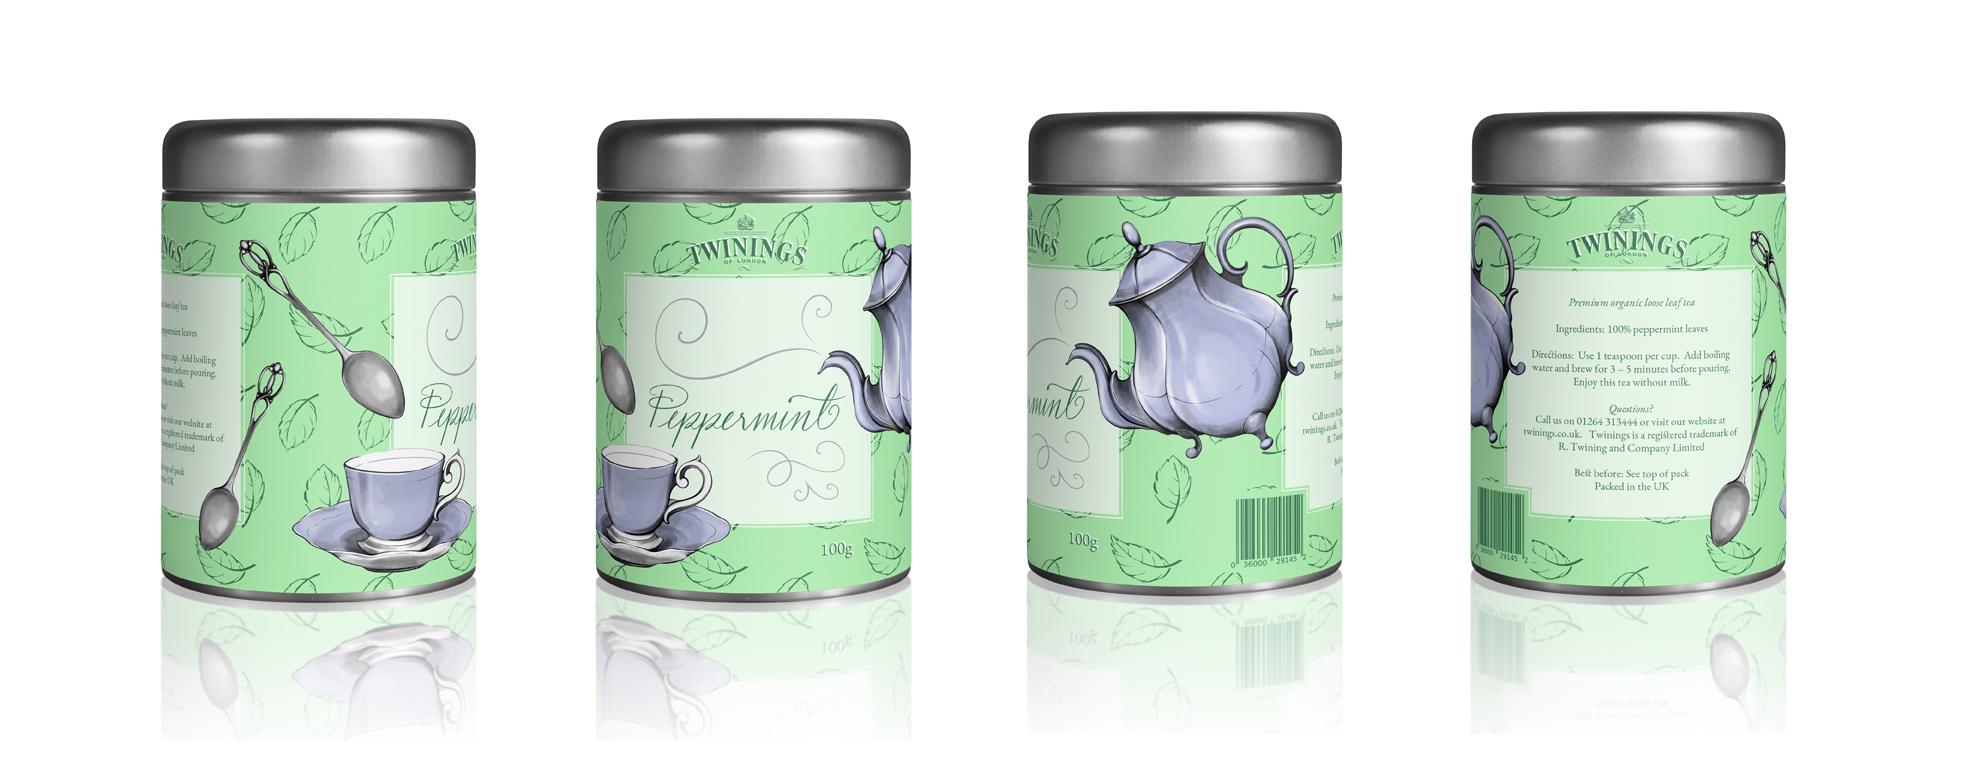 Illustrated Packaging - Tea